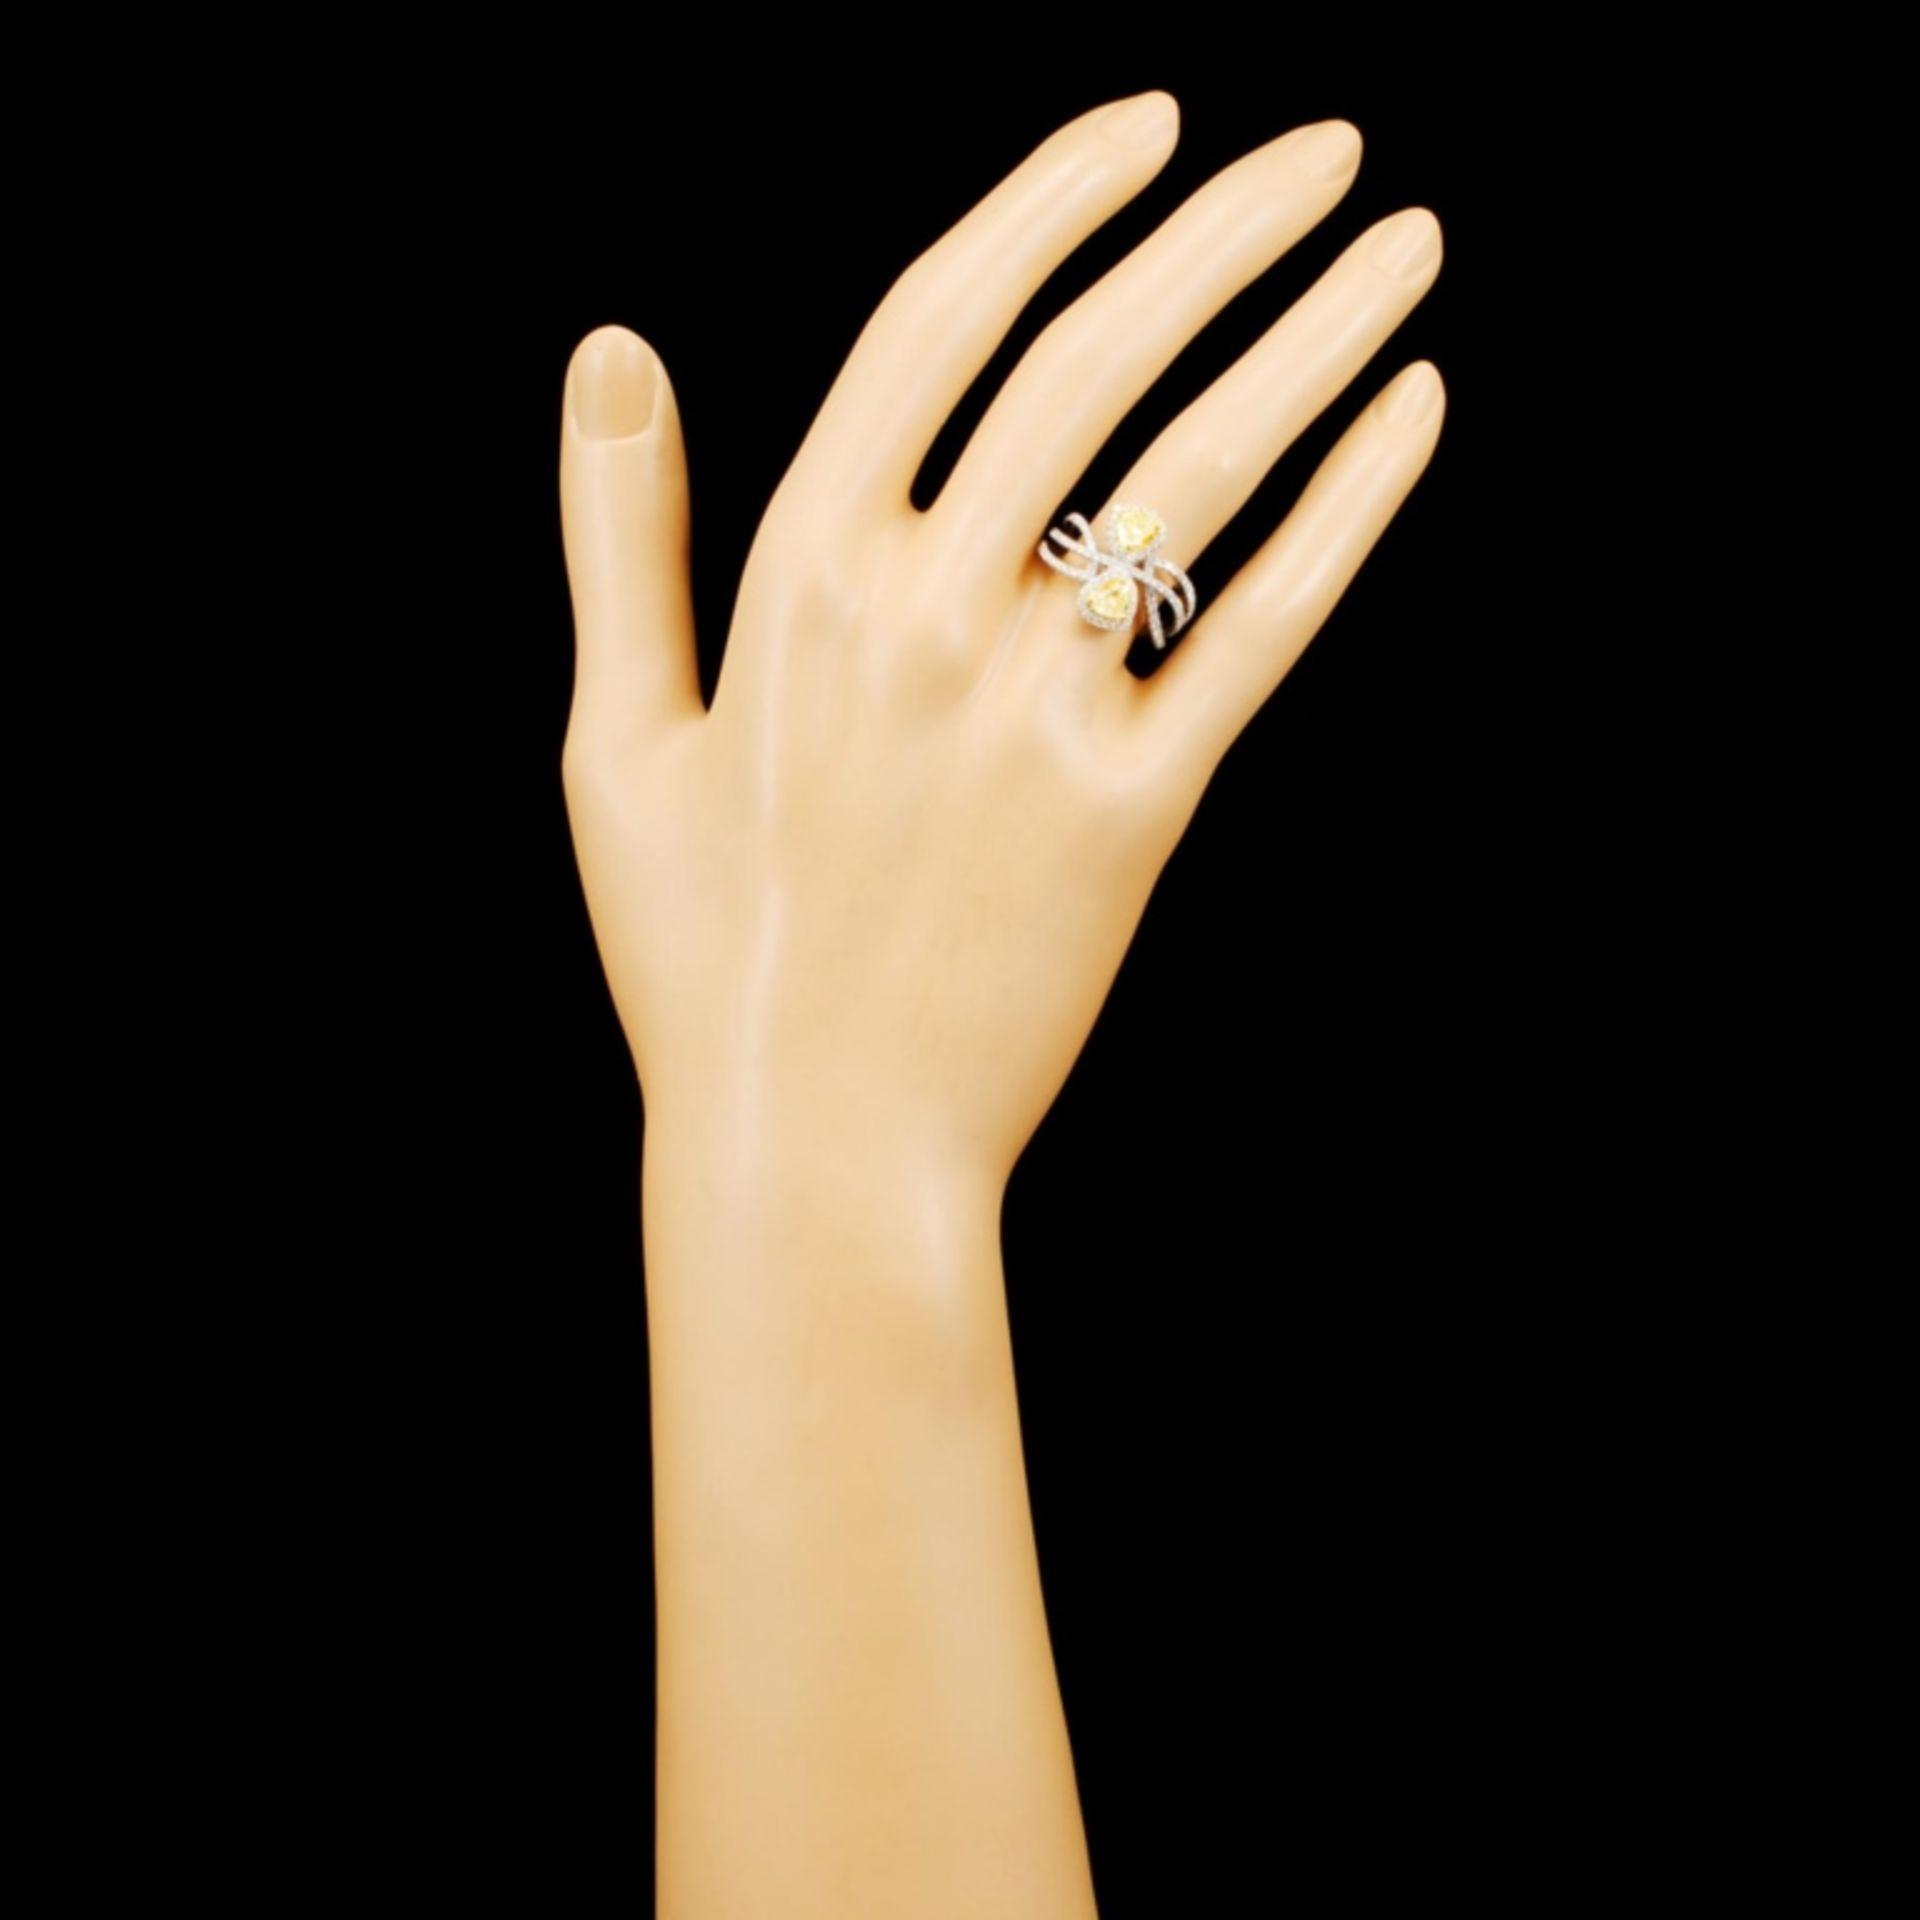 18K Gold 1.96ctw Diamond Ring - Image 4 of 5